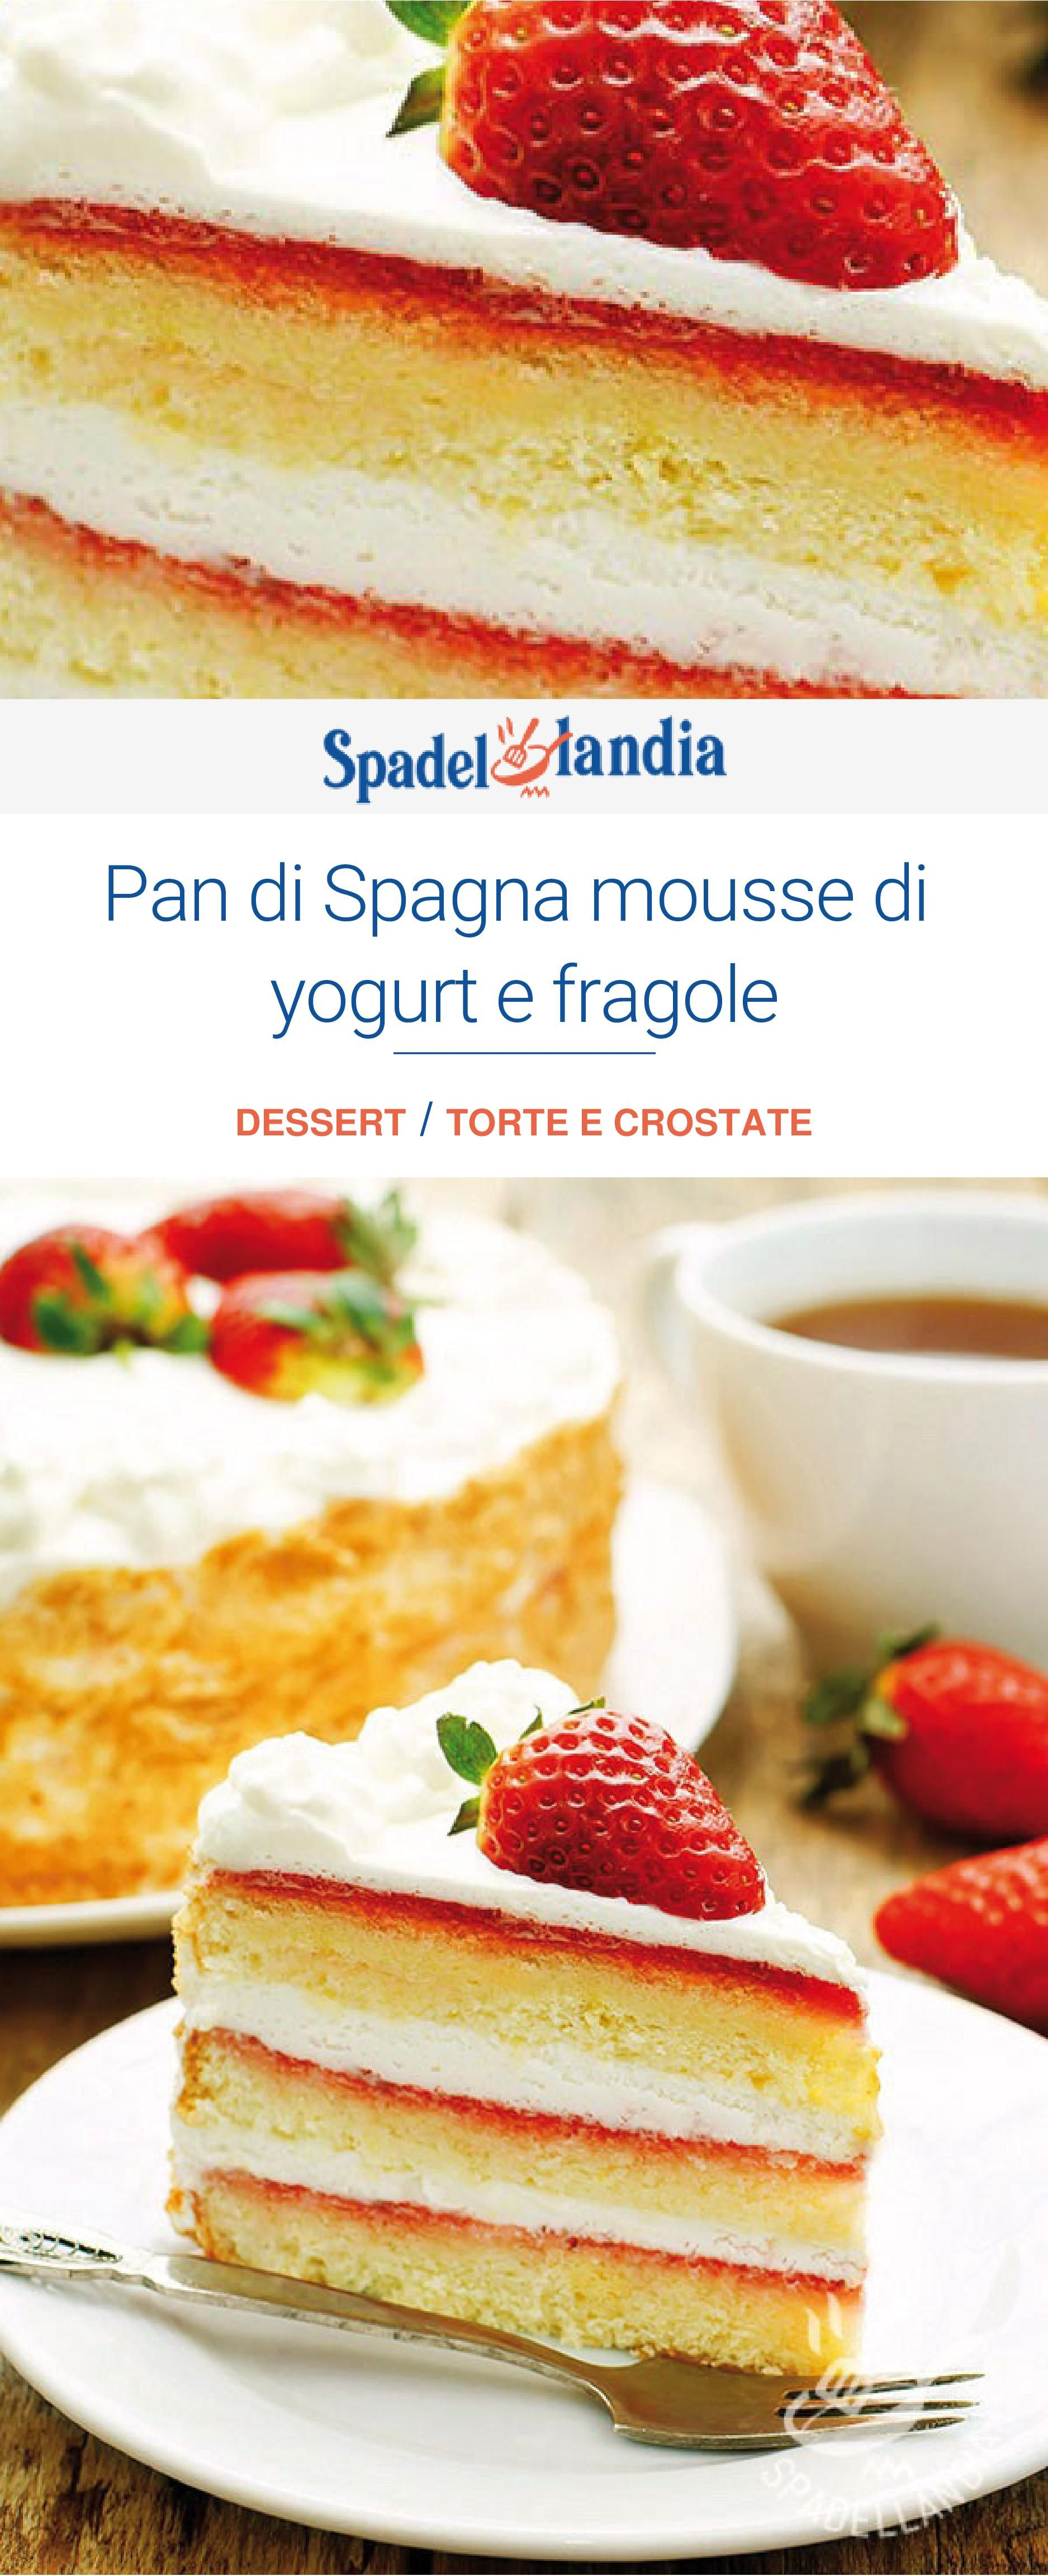 Ricetta Pan Di Spagna Yogurt.Pan Di Spagna Mousse Di Yogurt E Fragole Ricetta Ricette Di Mousse Fragole Mousse Dolce